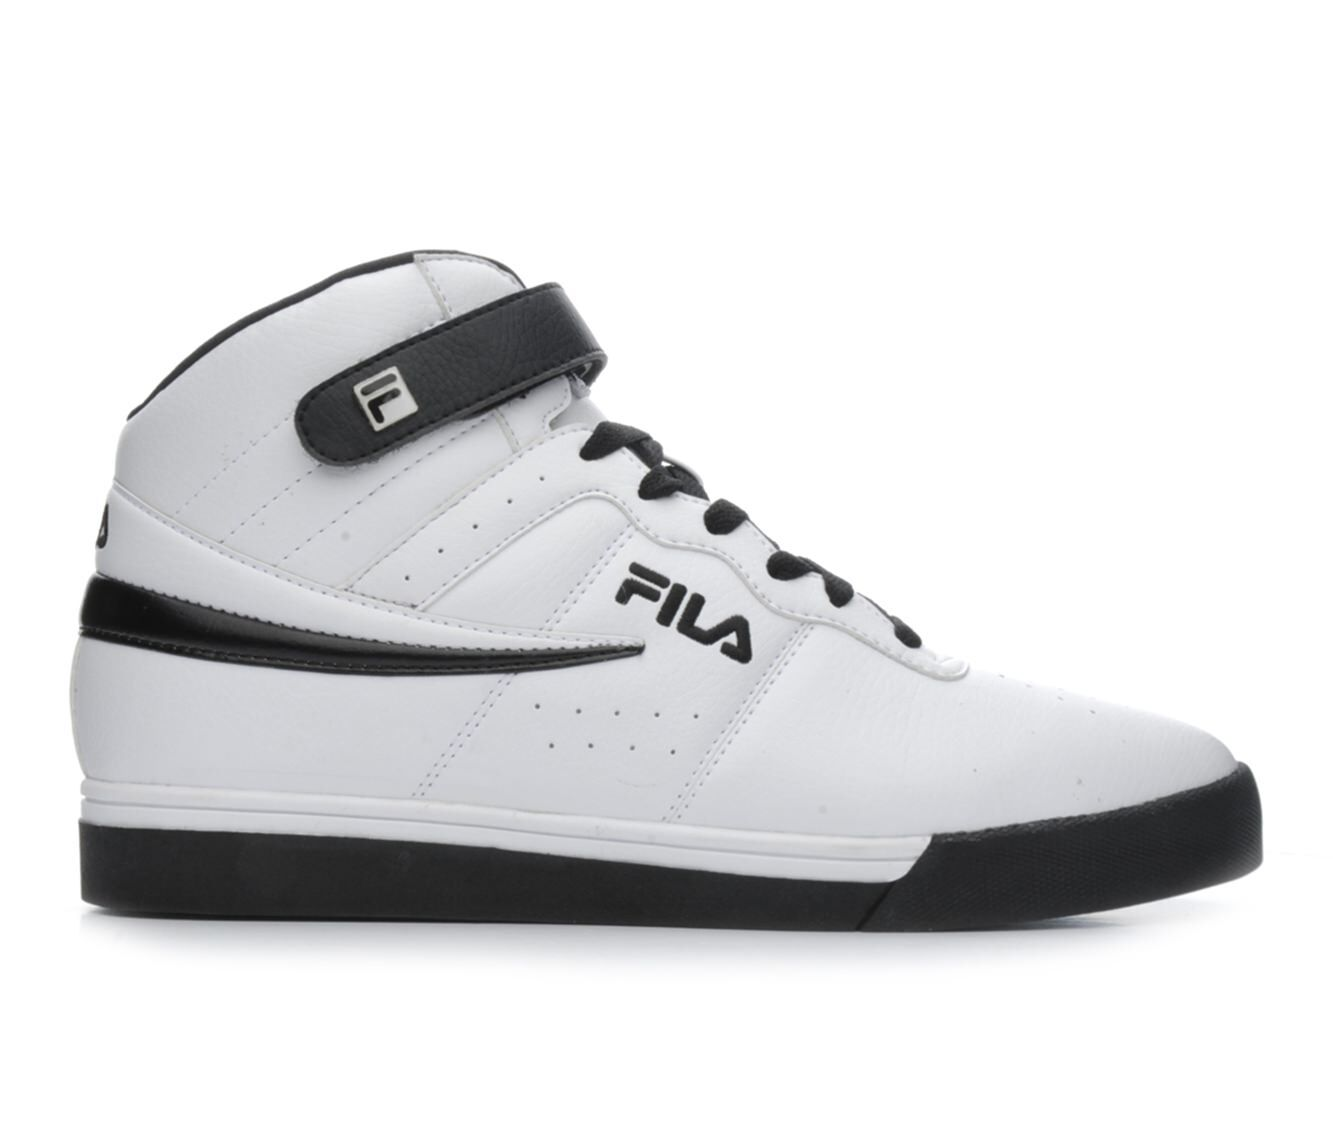 Men's Fila Vulc 13 Mid Plus Retro Sneakers White/Black